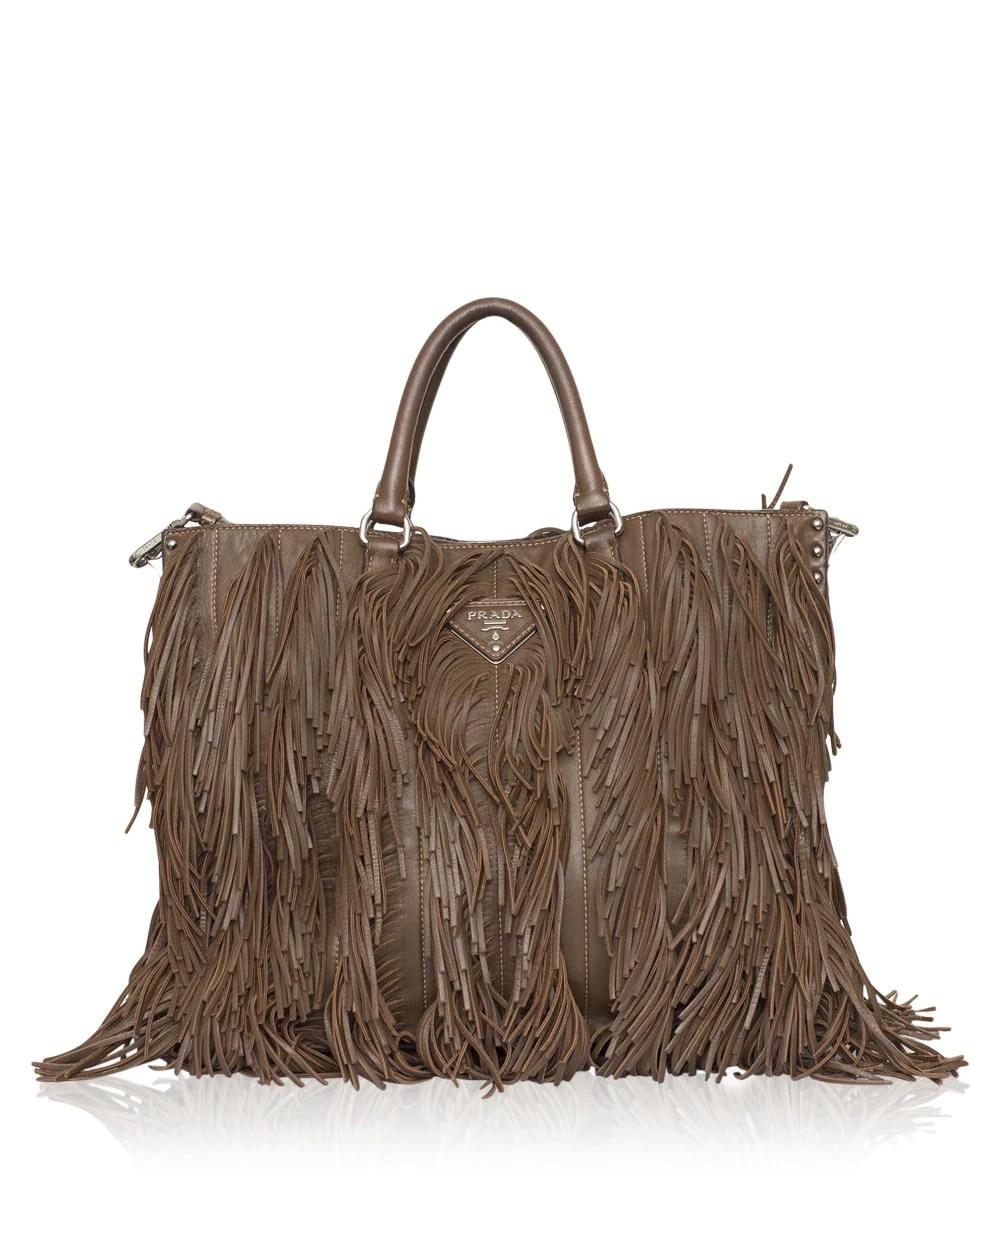 Prada Brown Nappa Fringe Tote Bag High Fashion Society